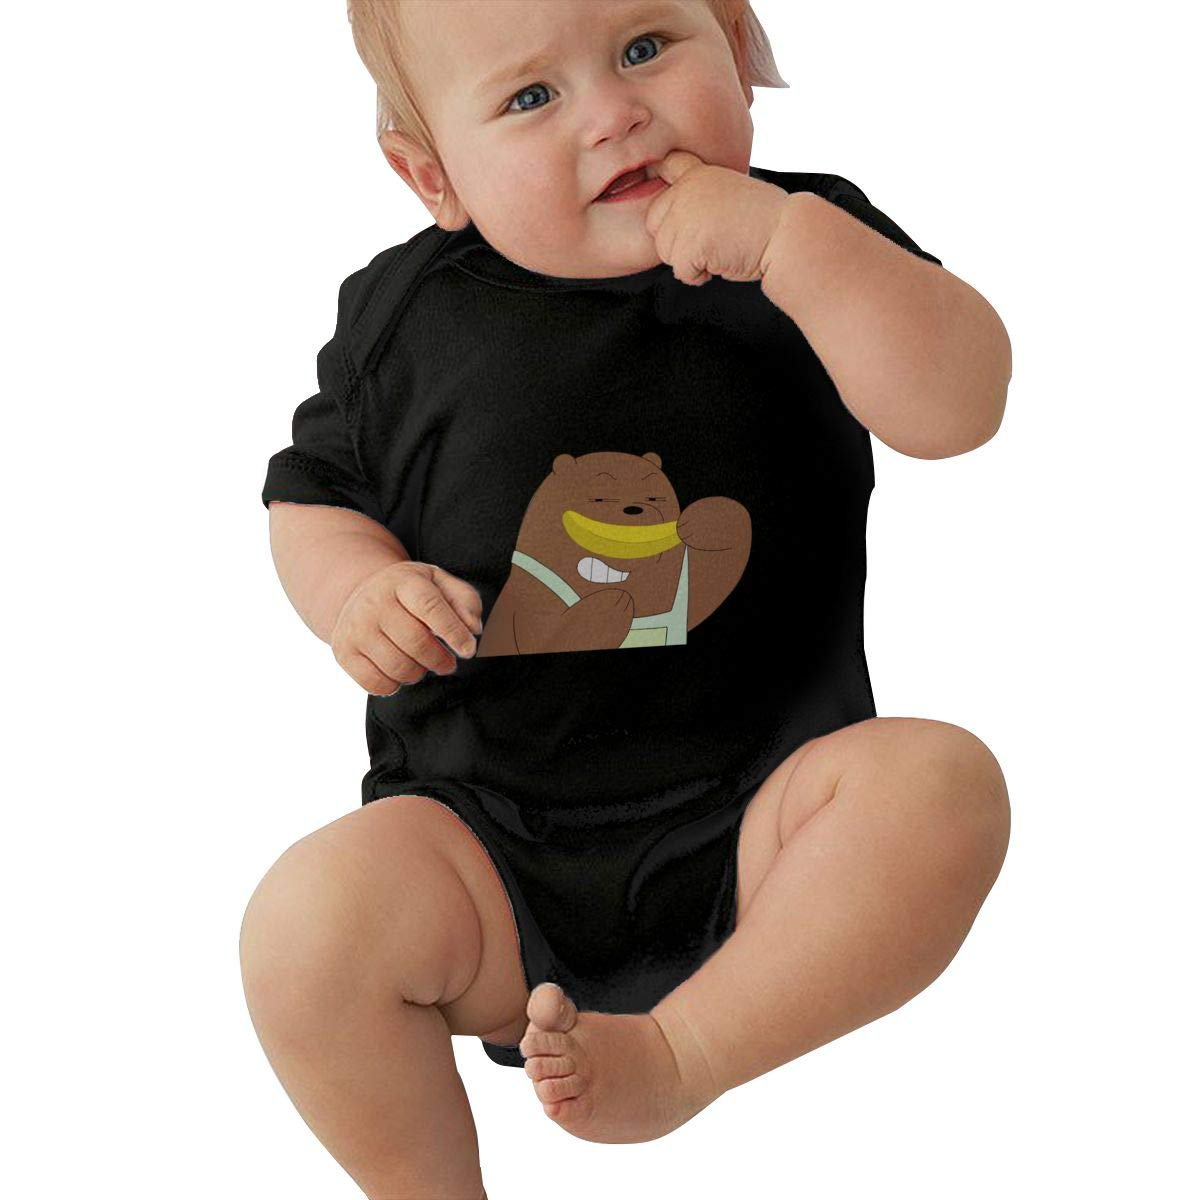 UyGFYytg Flag of Denmark Baby Newborn Crawling Suit Sleeveless Onesie Romper Jumpsuit Black